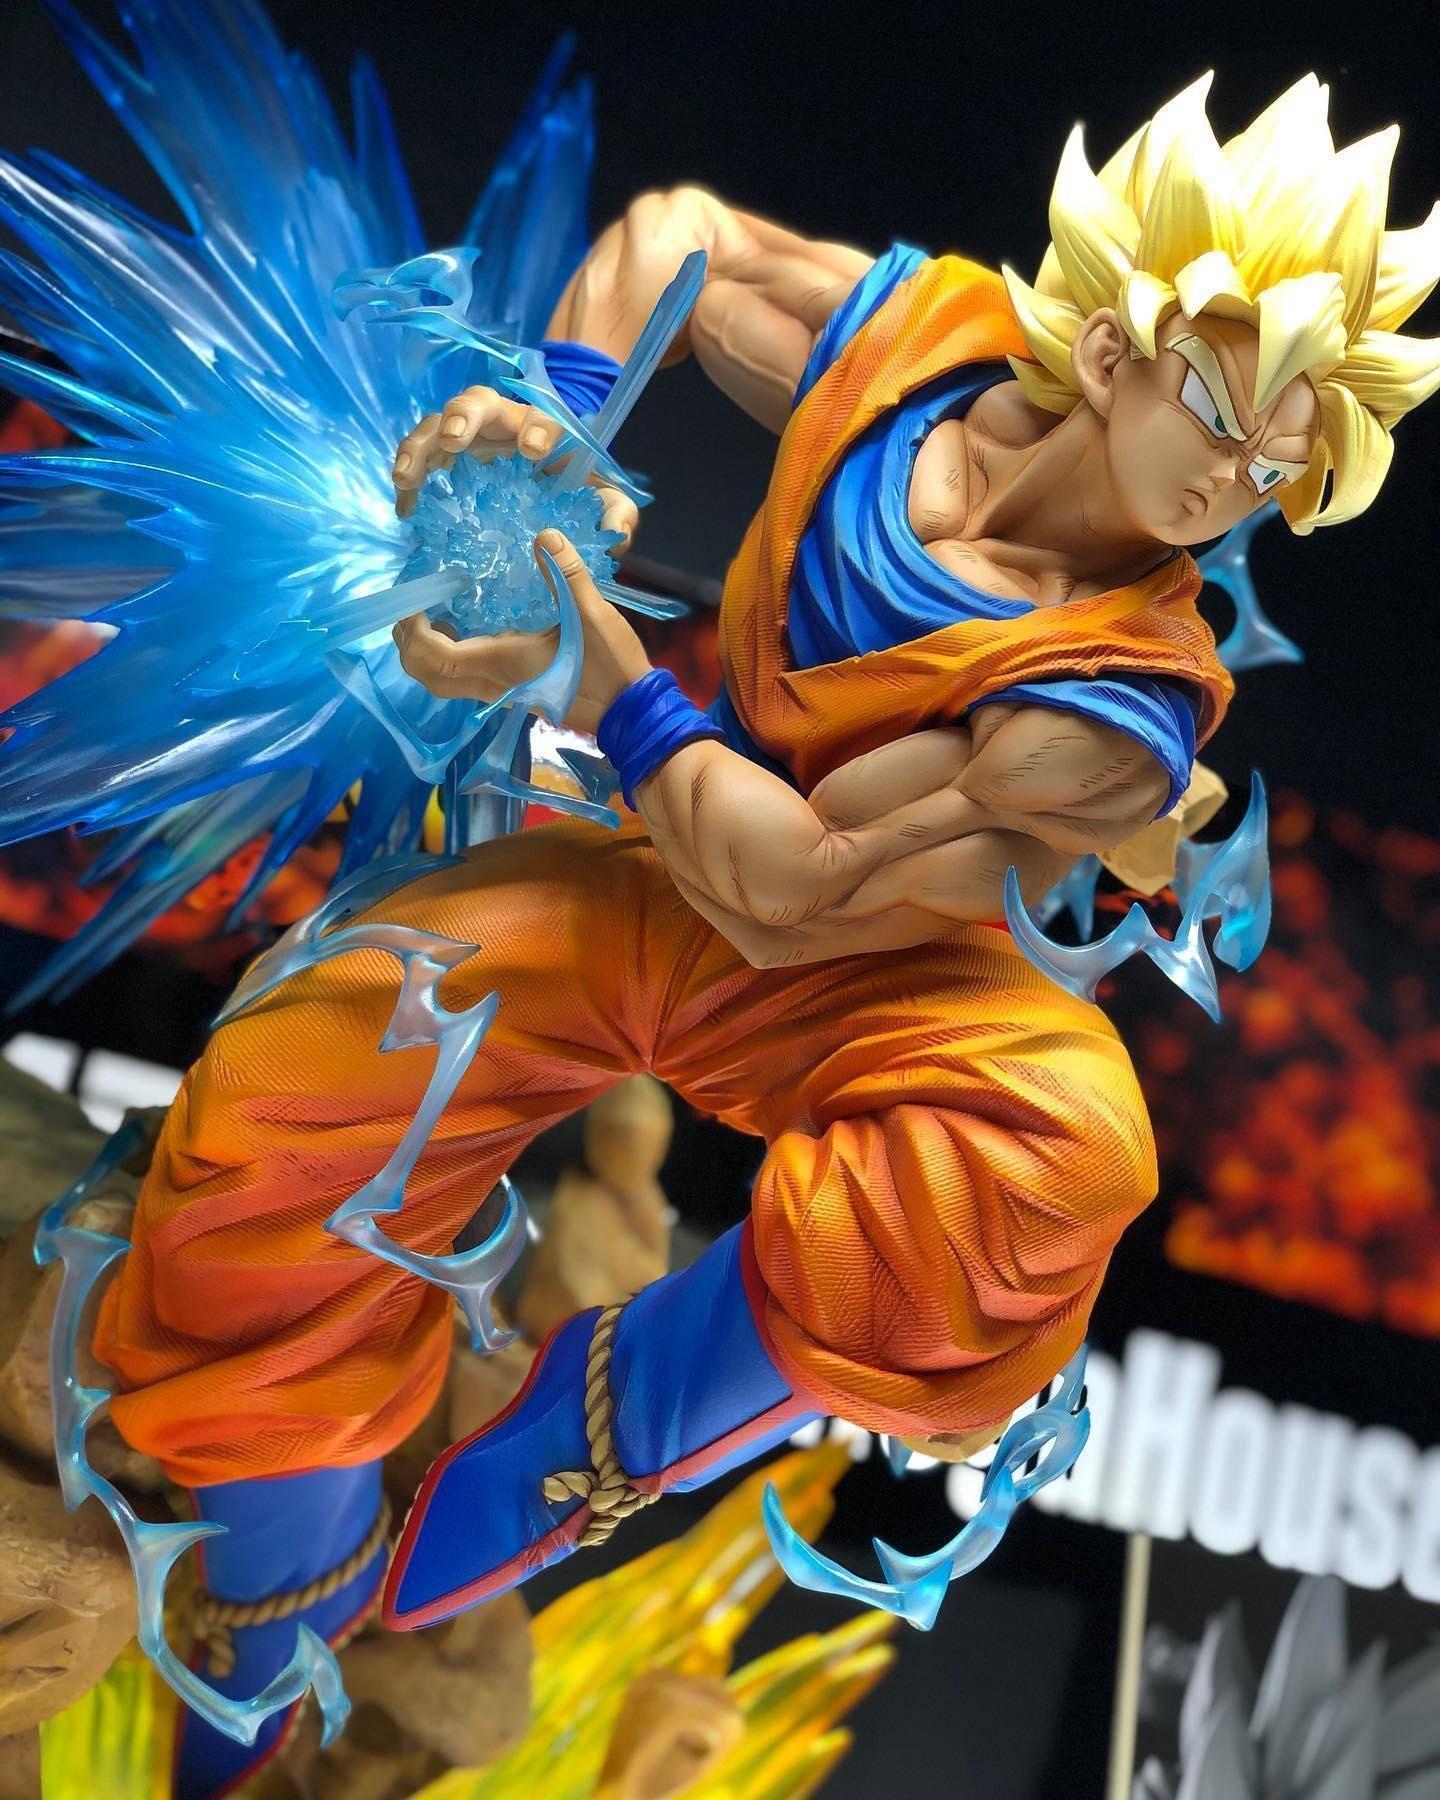 Dragon Ball Z Son Gokou Super Saiyan Action Figure Statues Toys Anime Manga